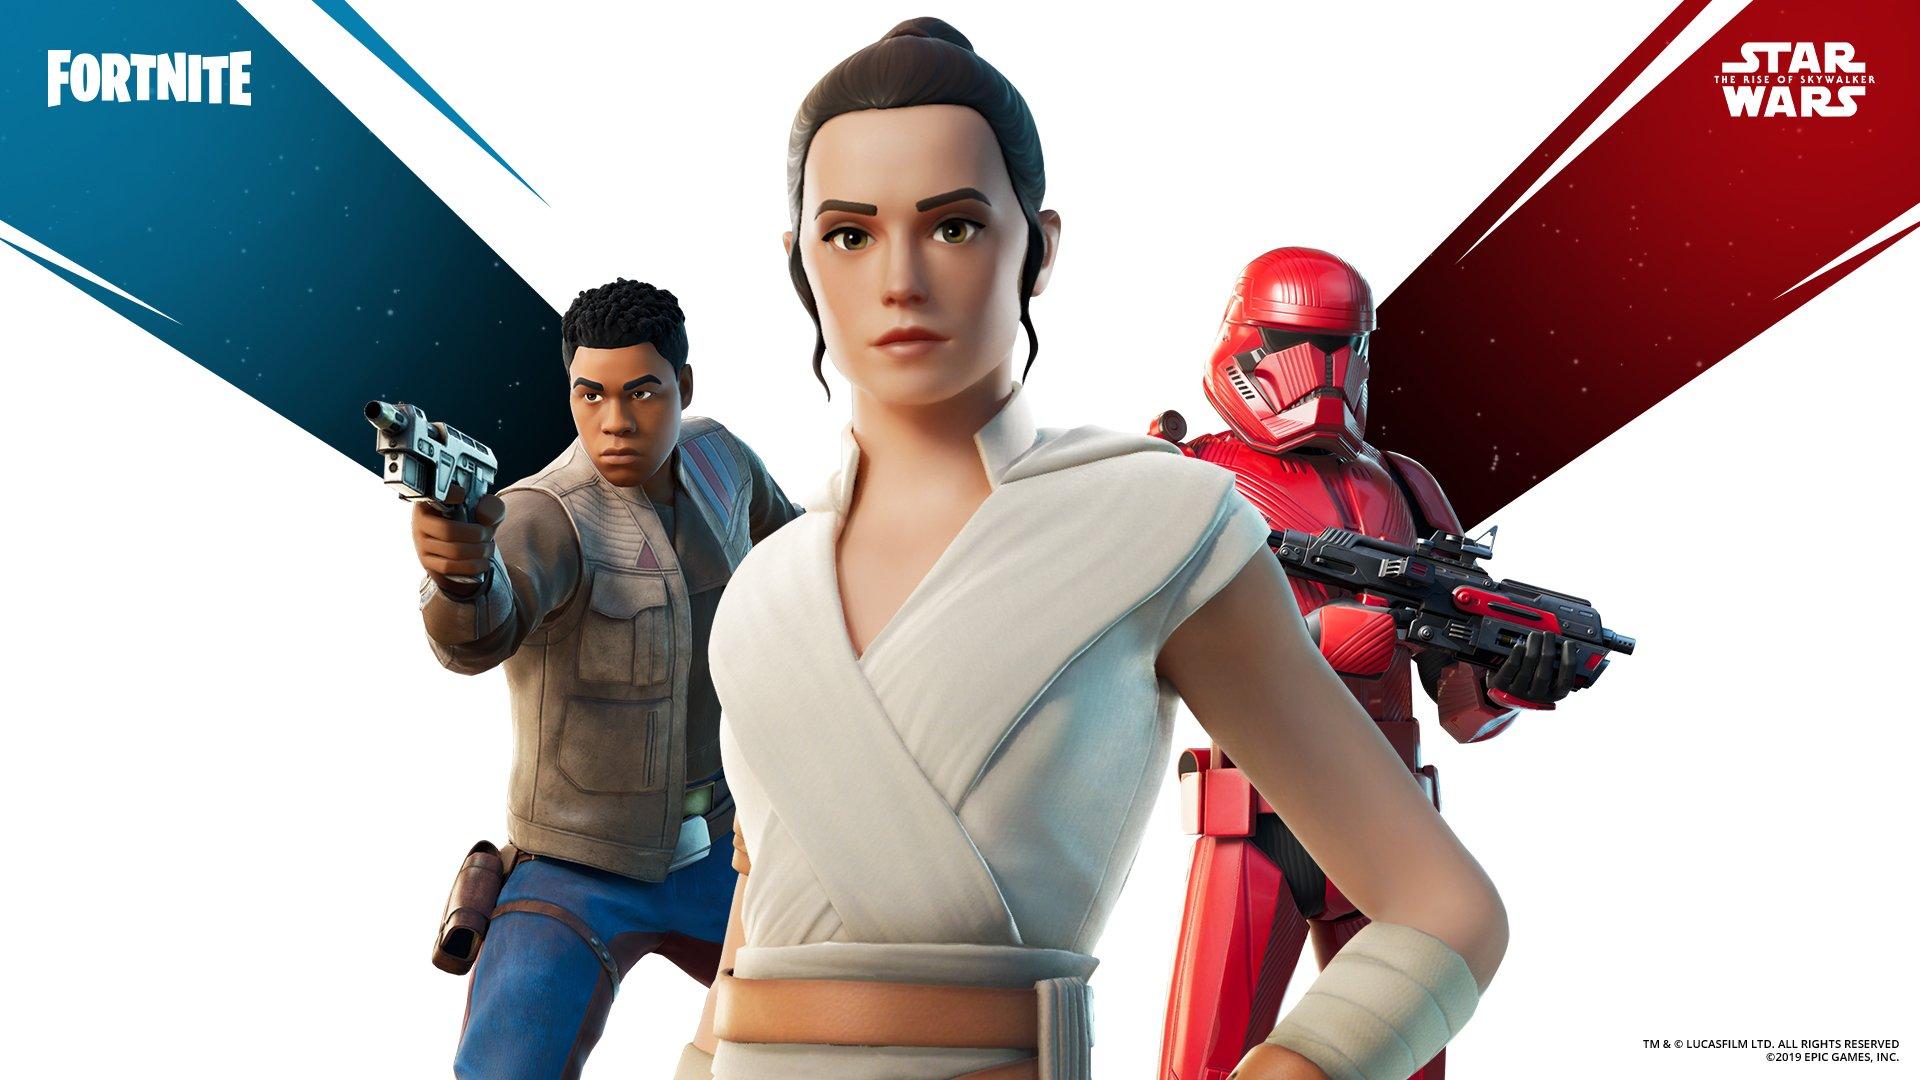 Fortnite Star Wars Rise of Skywalker Skin Pack